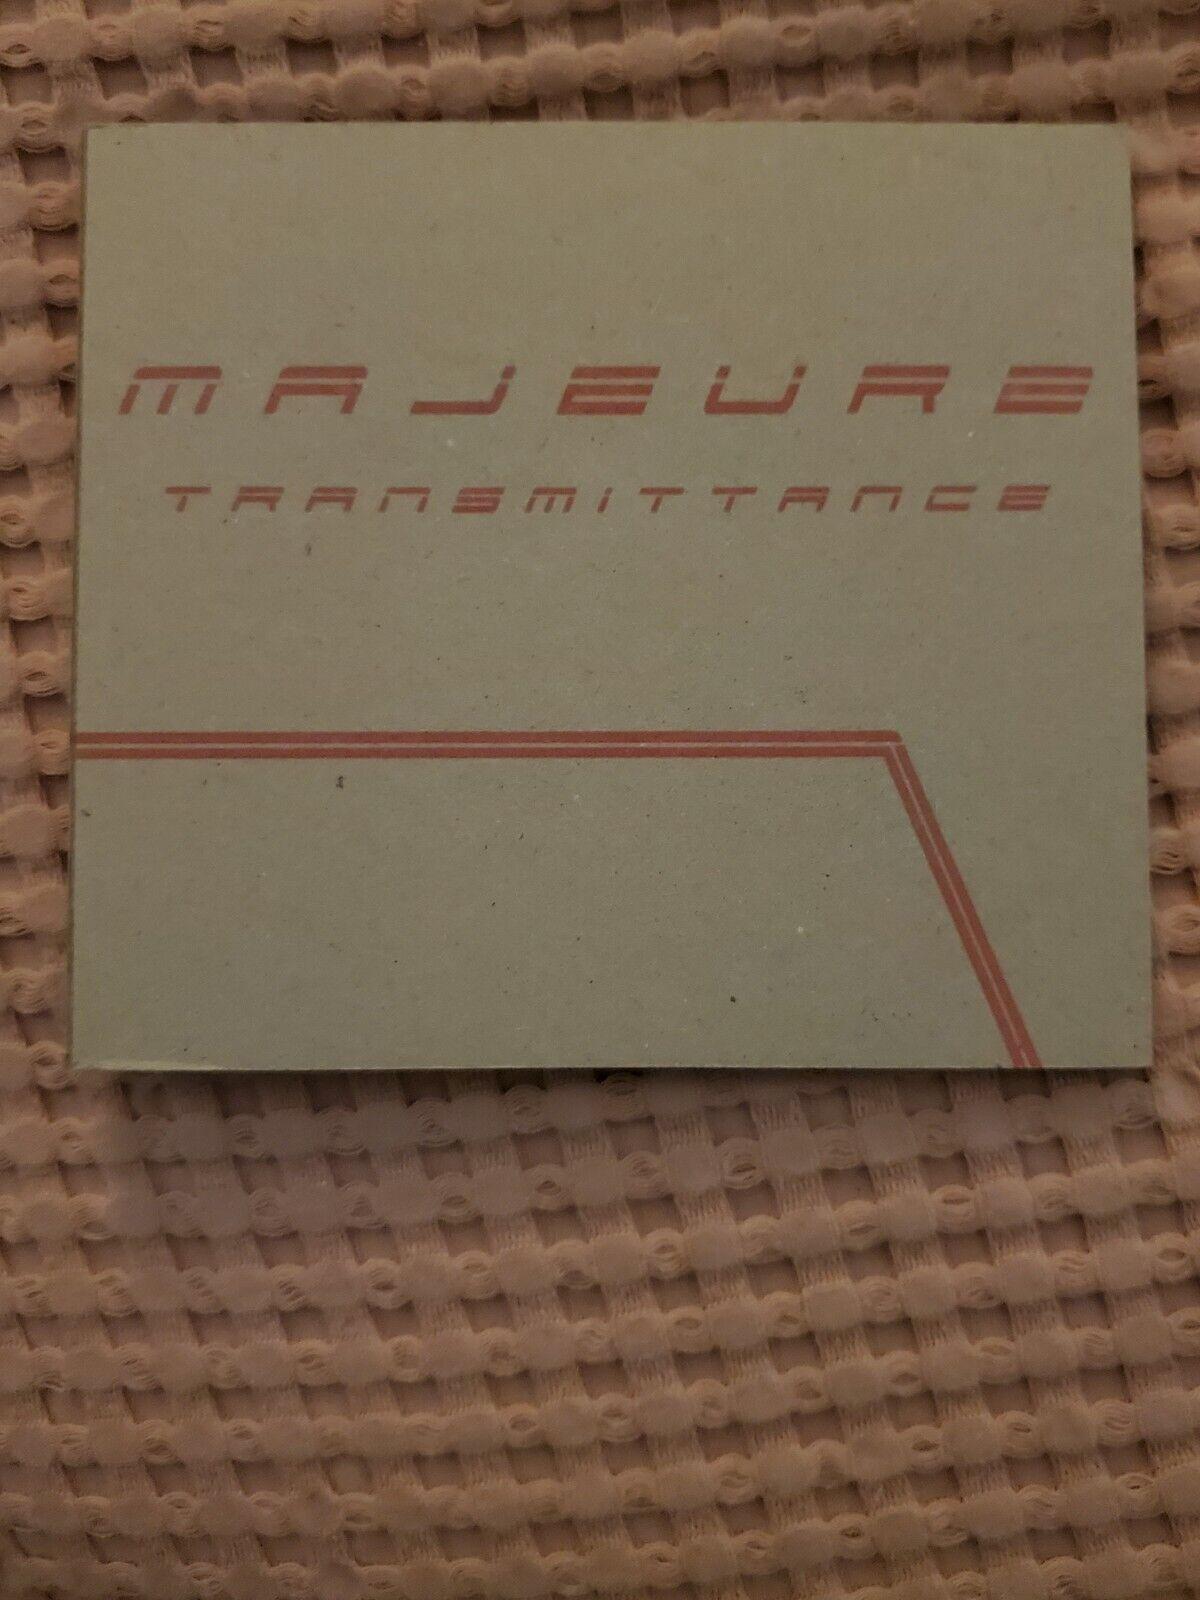 Majeure- Transmittance- CD- Prog Rock- Zombi- Live- OOP RARE- 120 Of 200 - $15.00